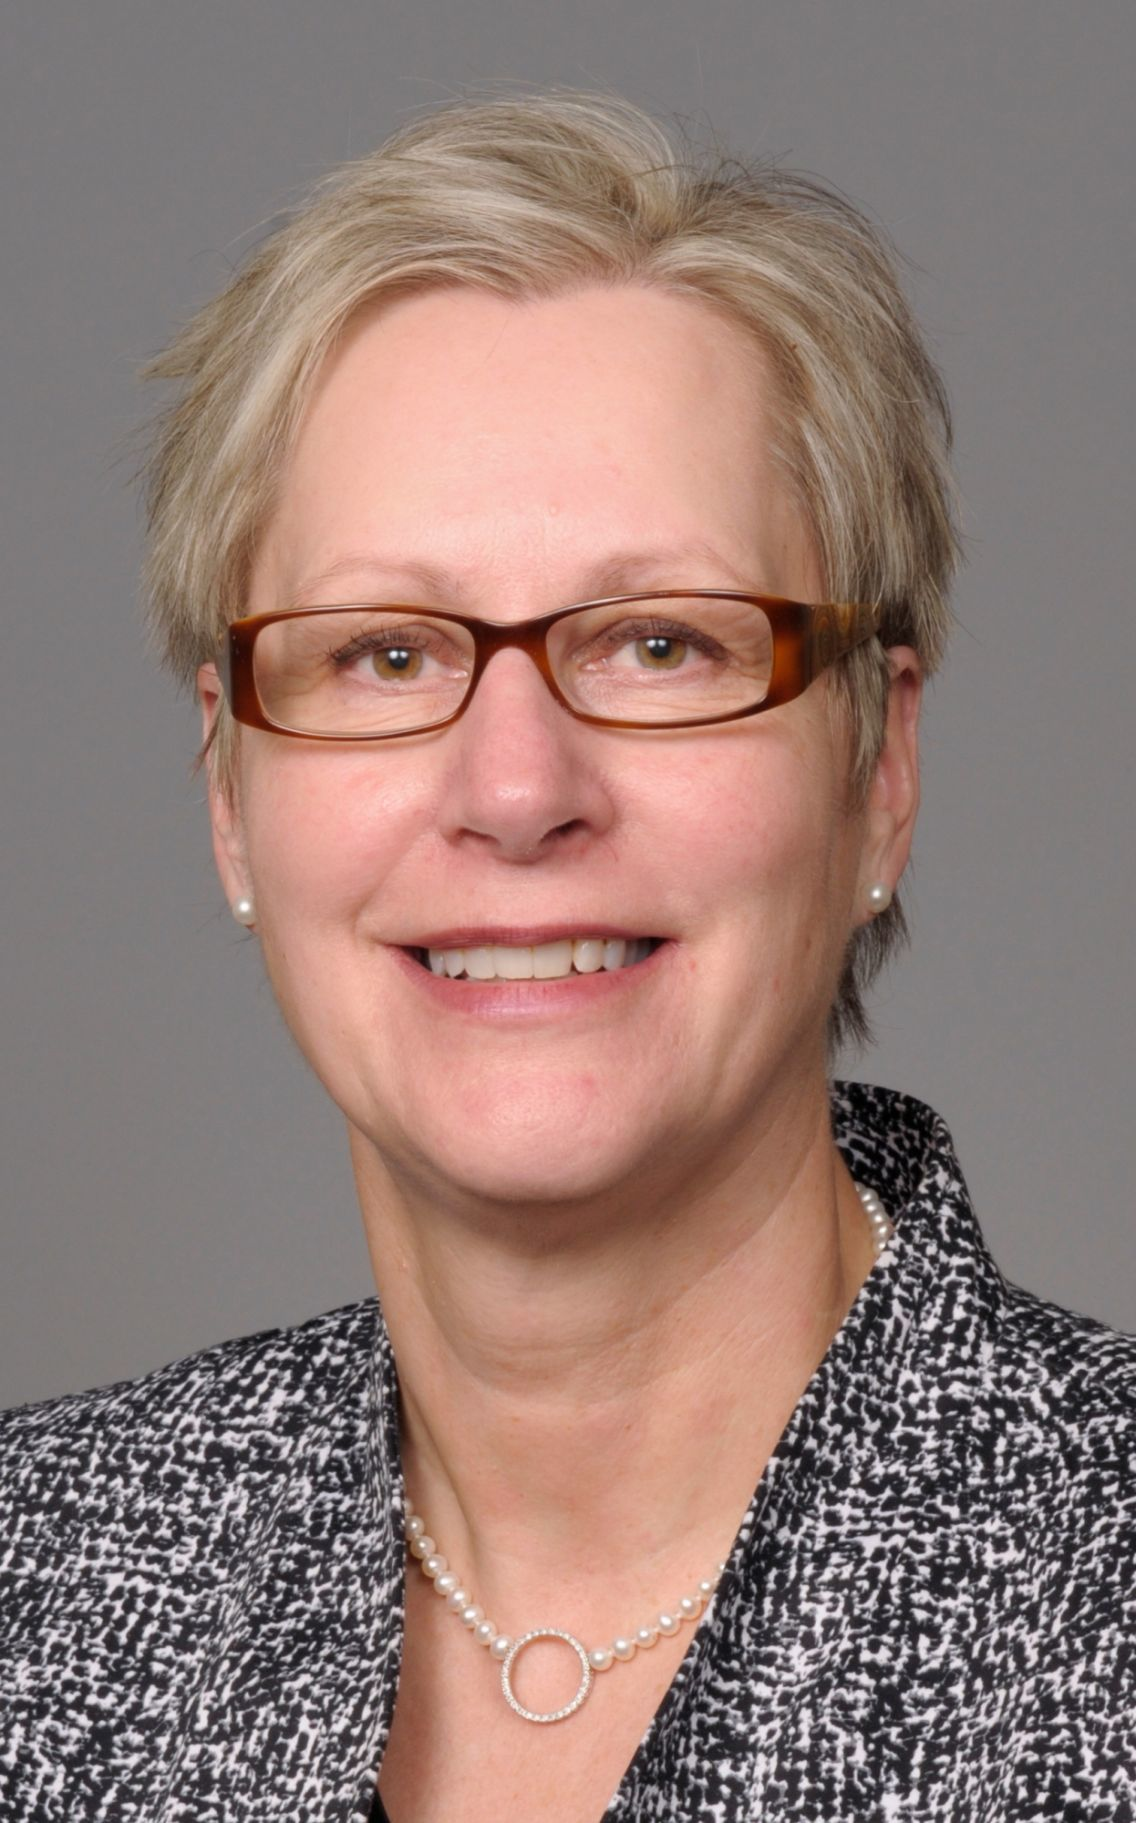 Liz Wagstrom